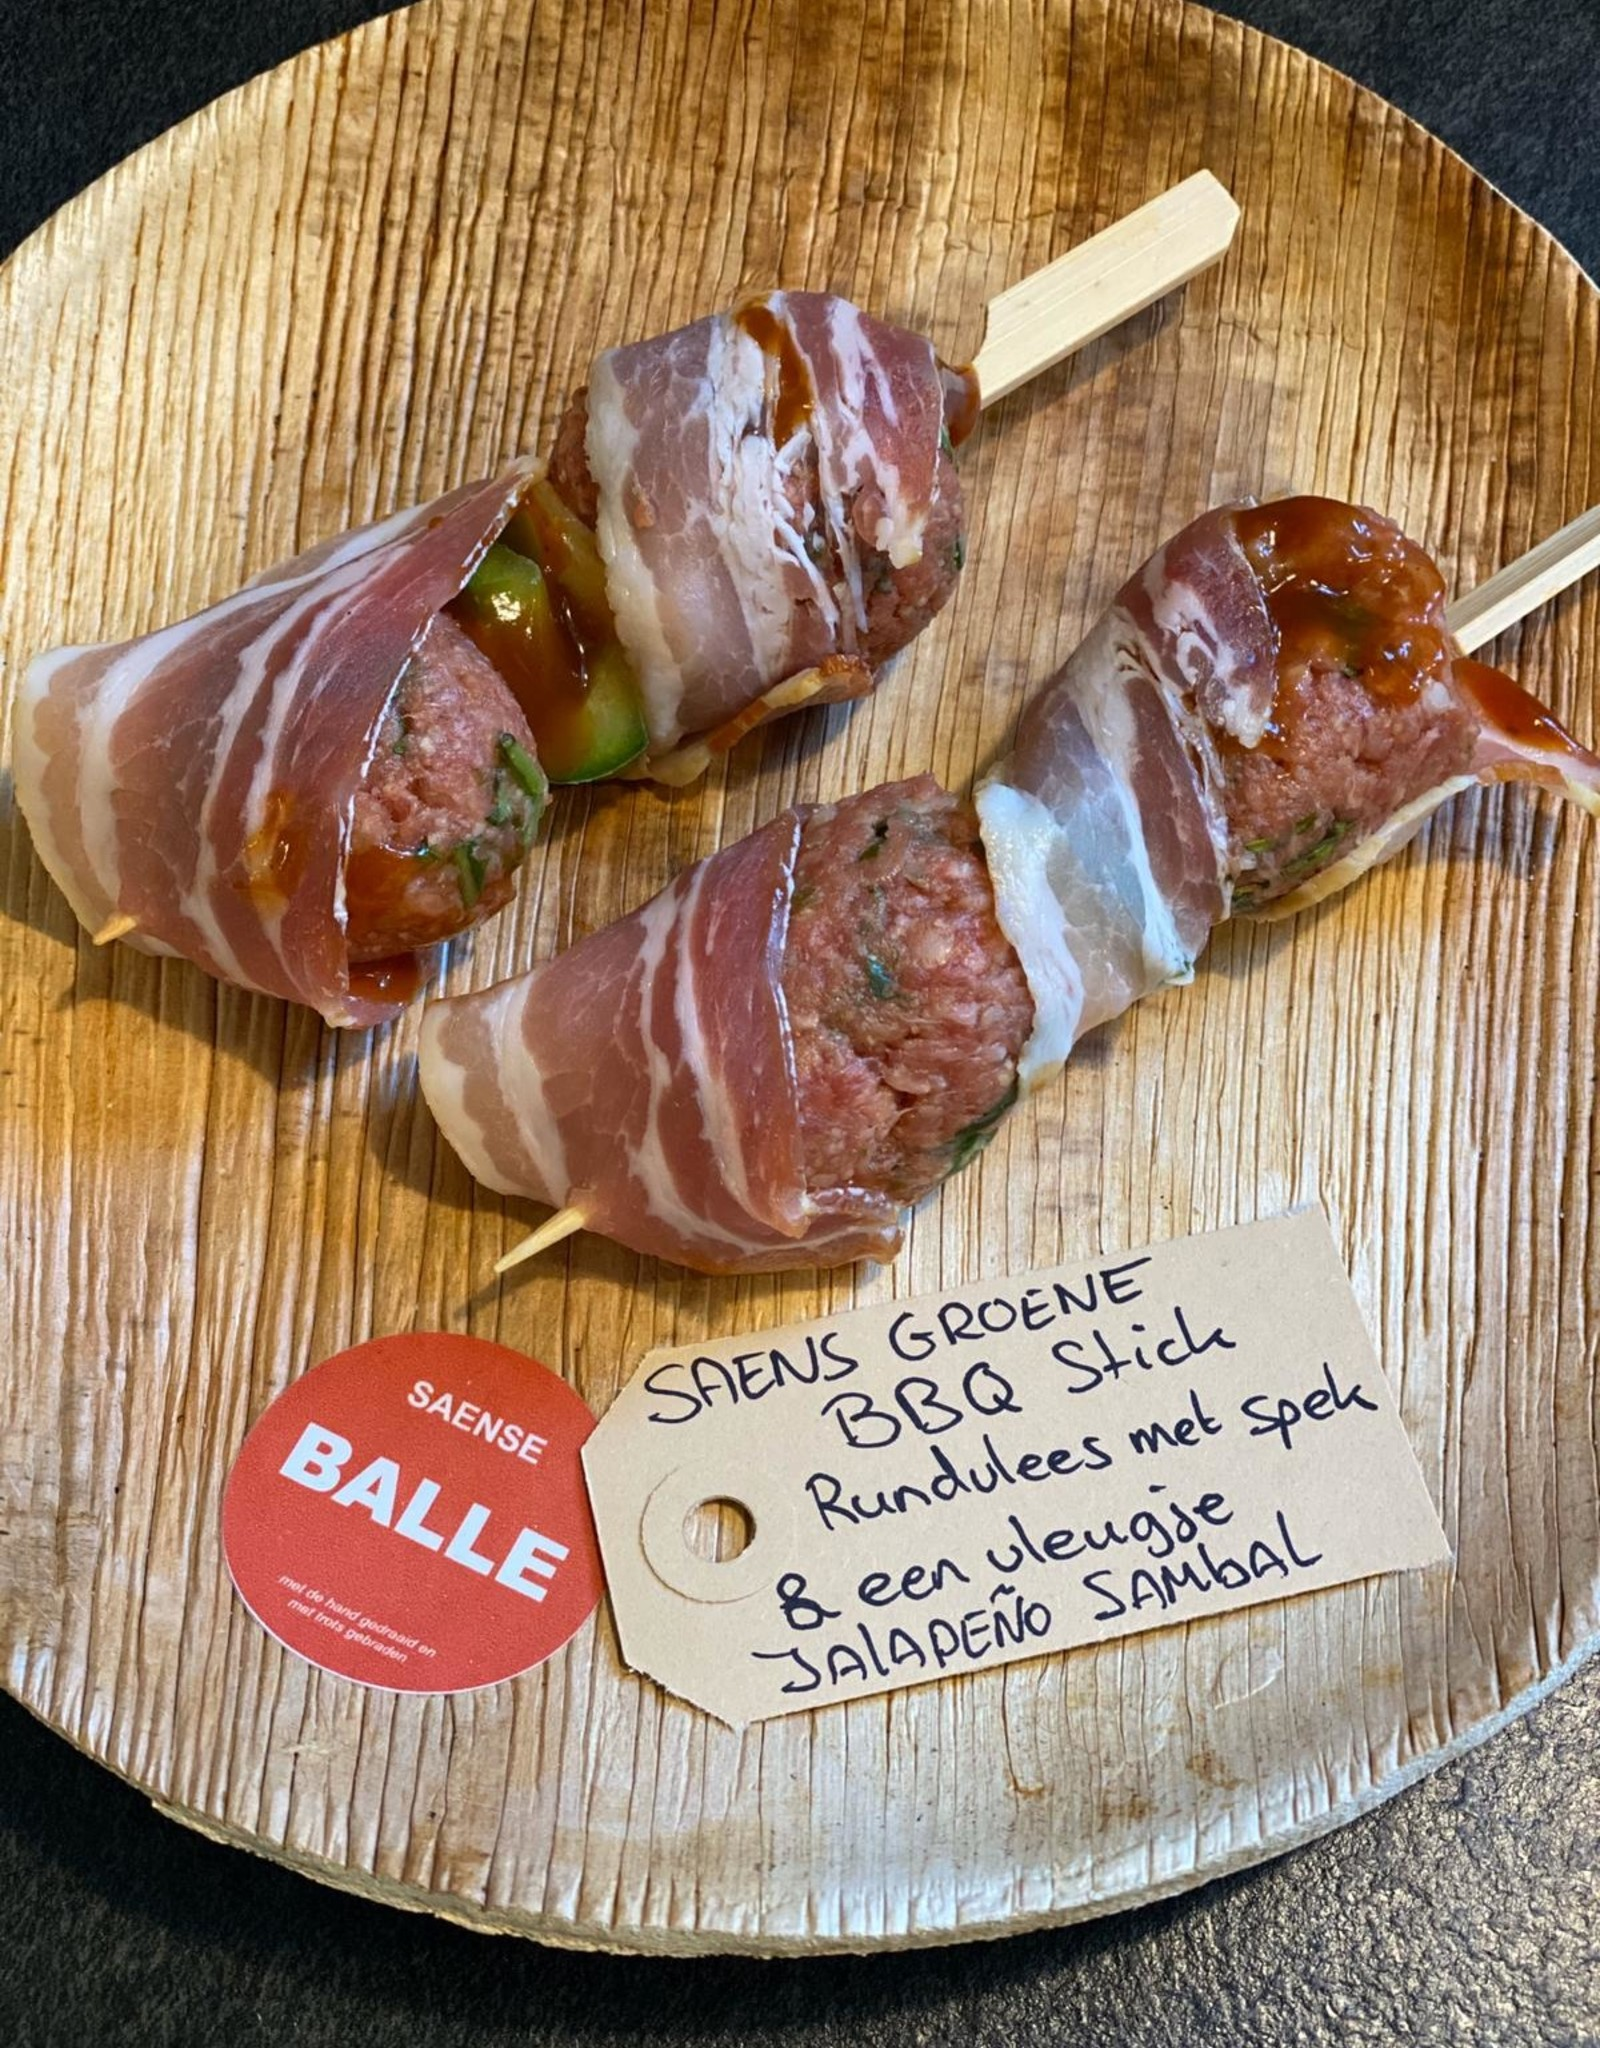 Saense Balle BBQ stick